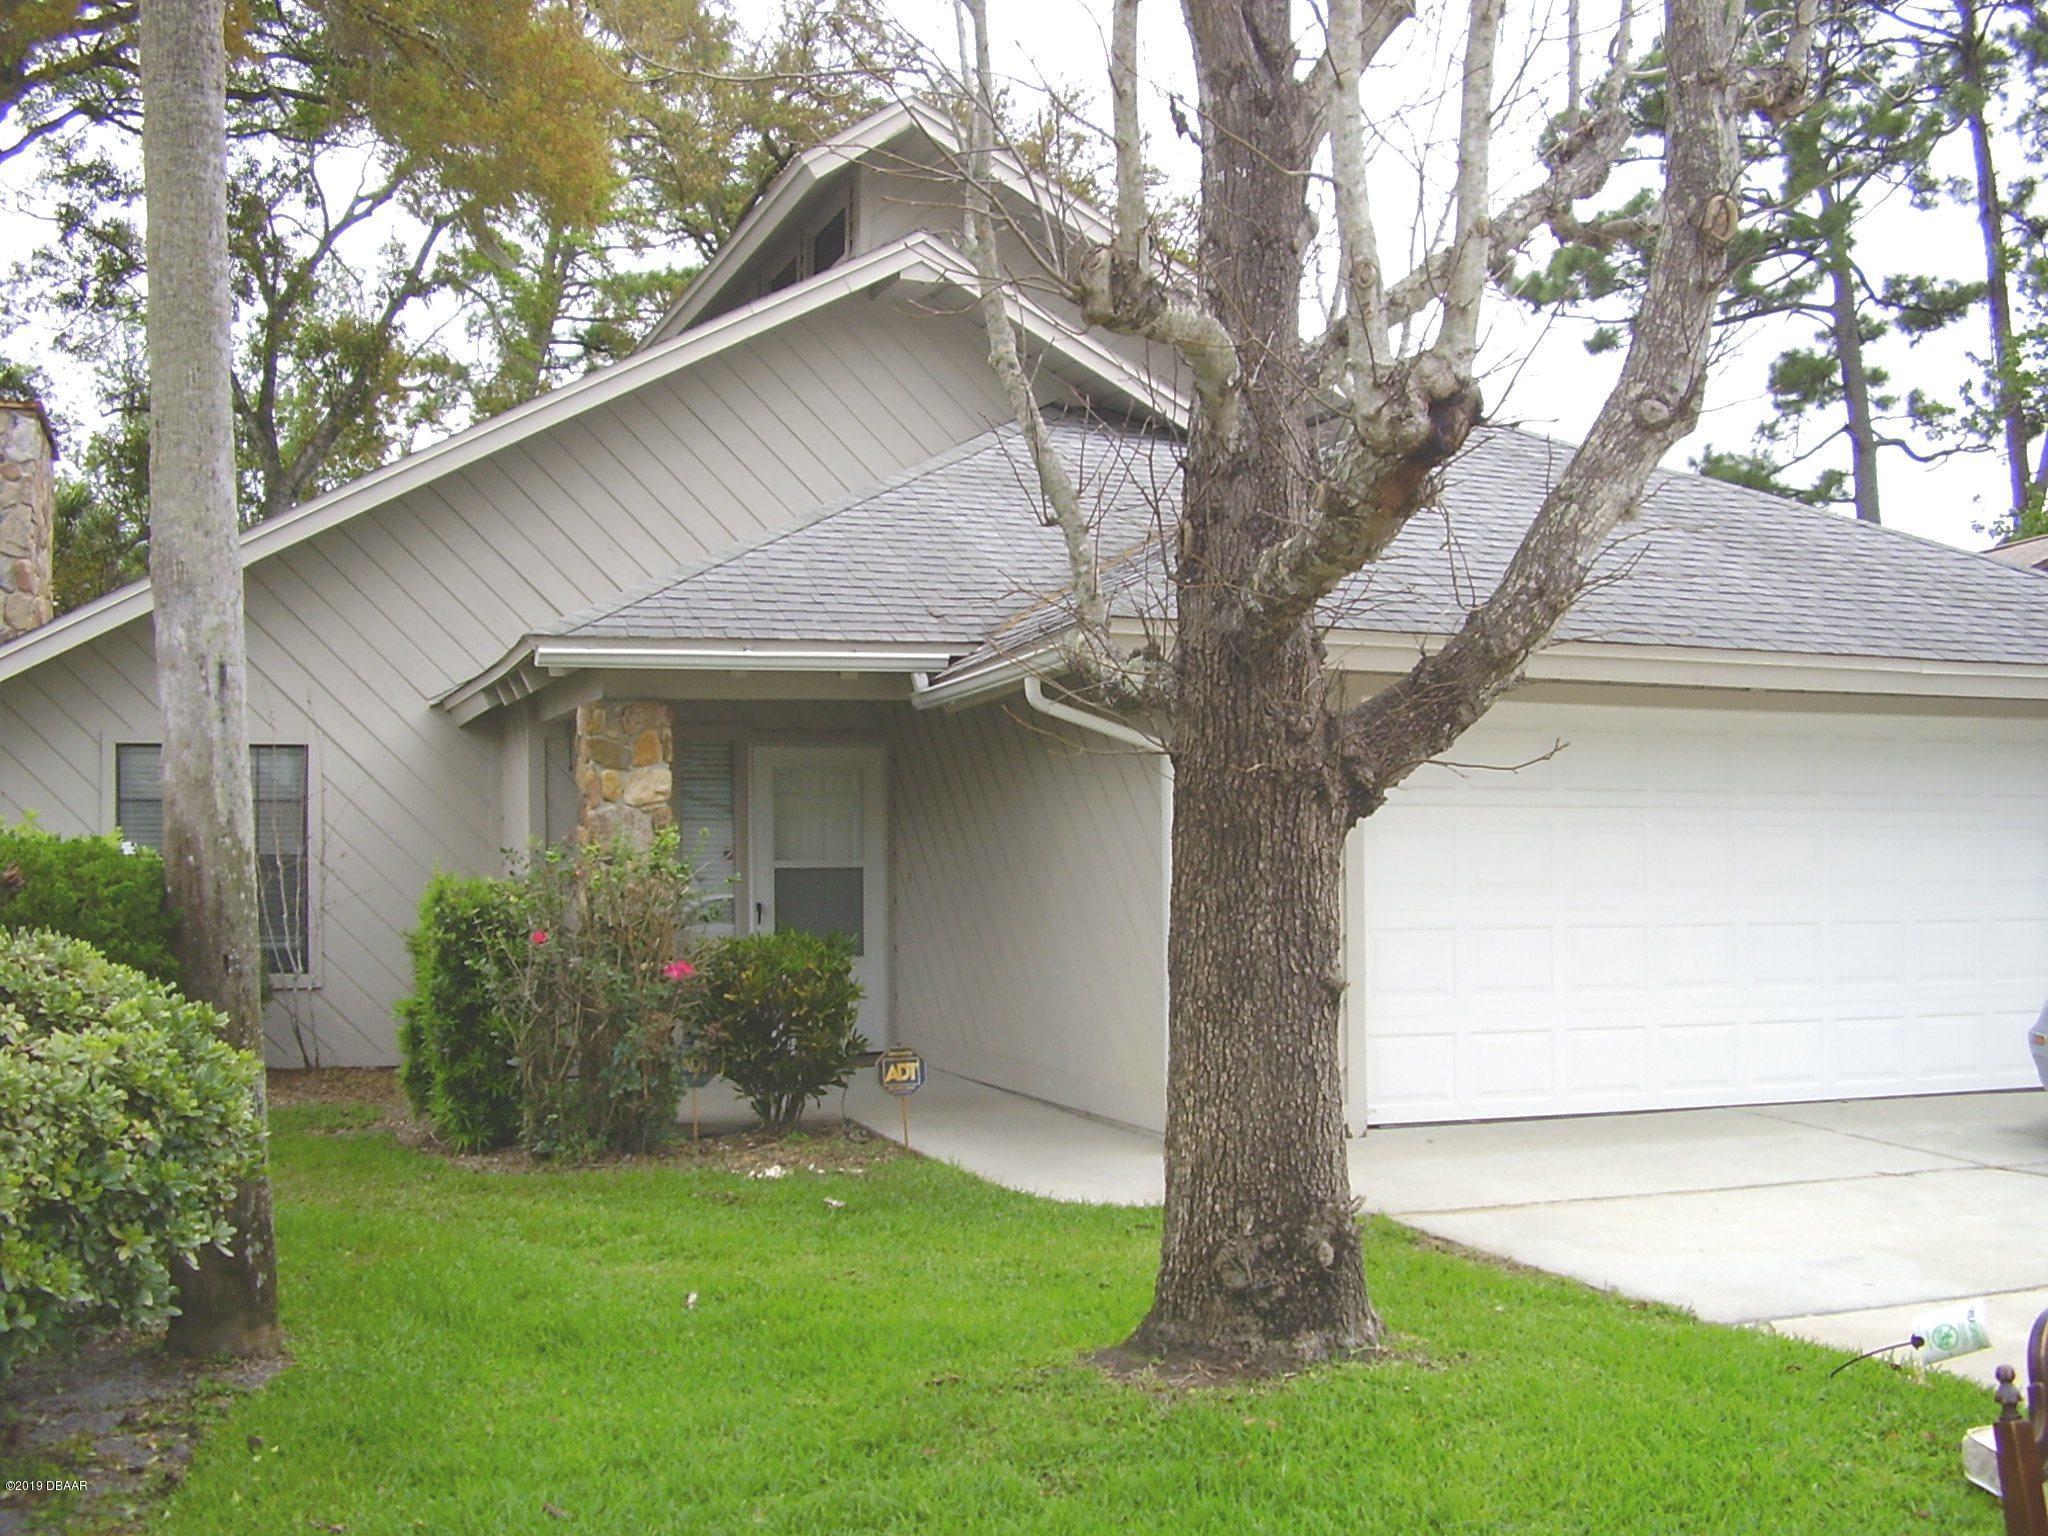 Photo of 930 N Lakewood Terrace, Port Orange, FL 32127